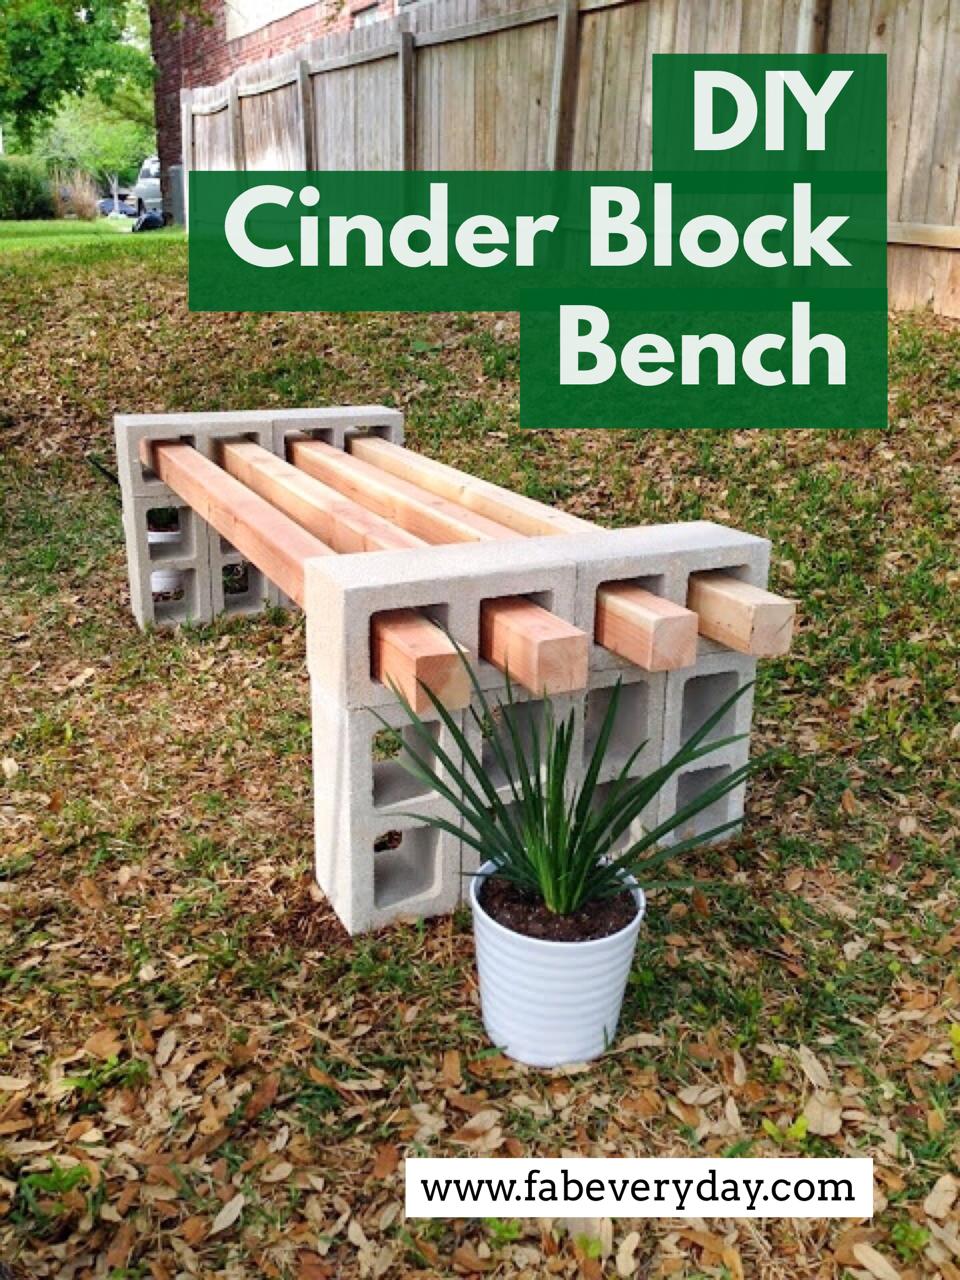 Diy Cinder Block Bench Fab Everyday